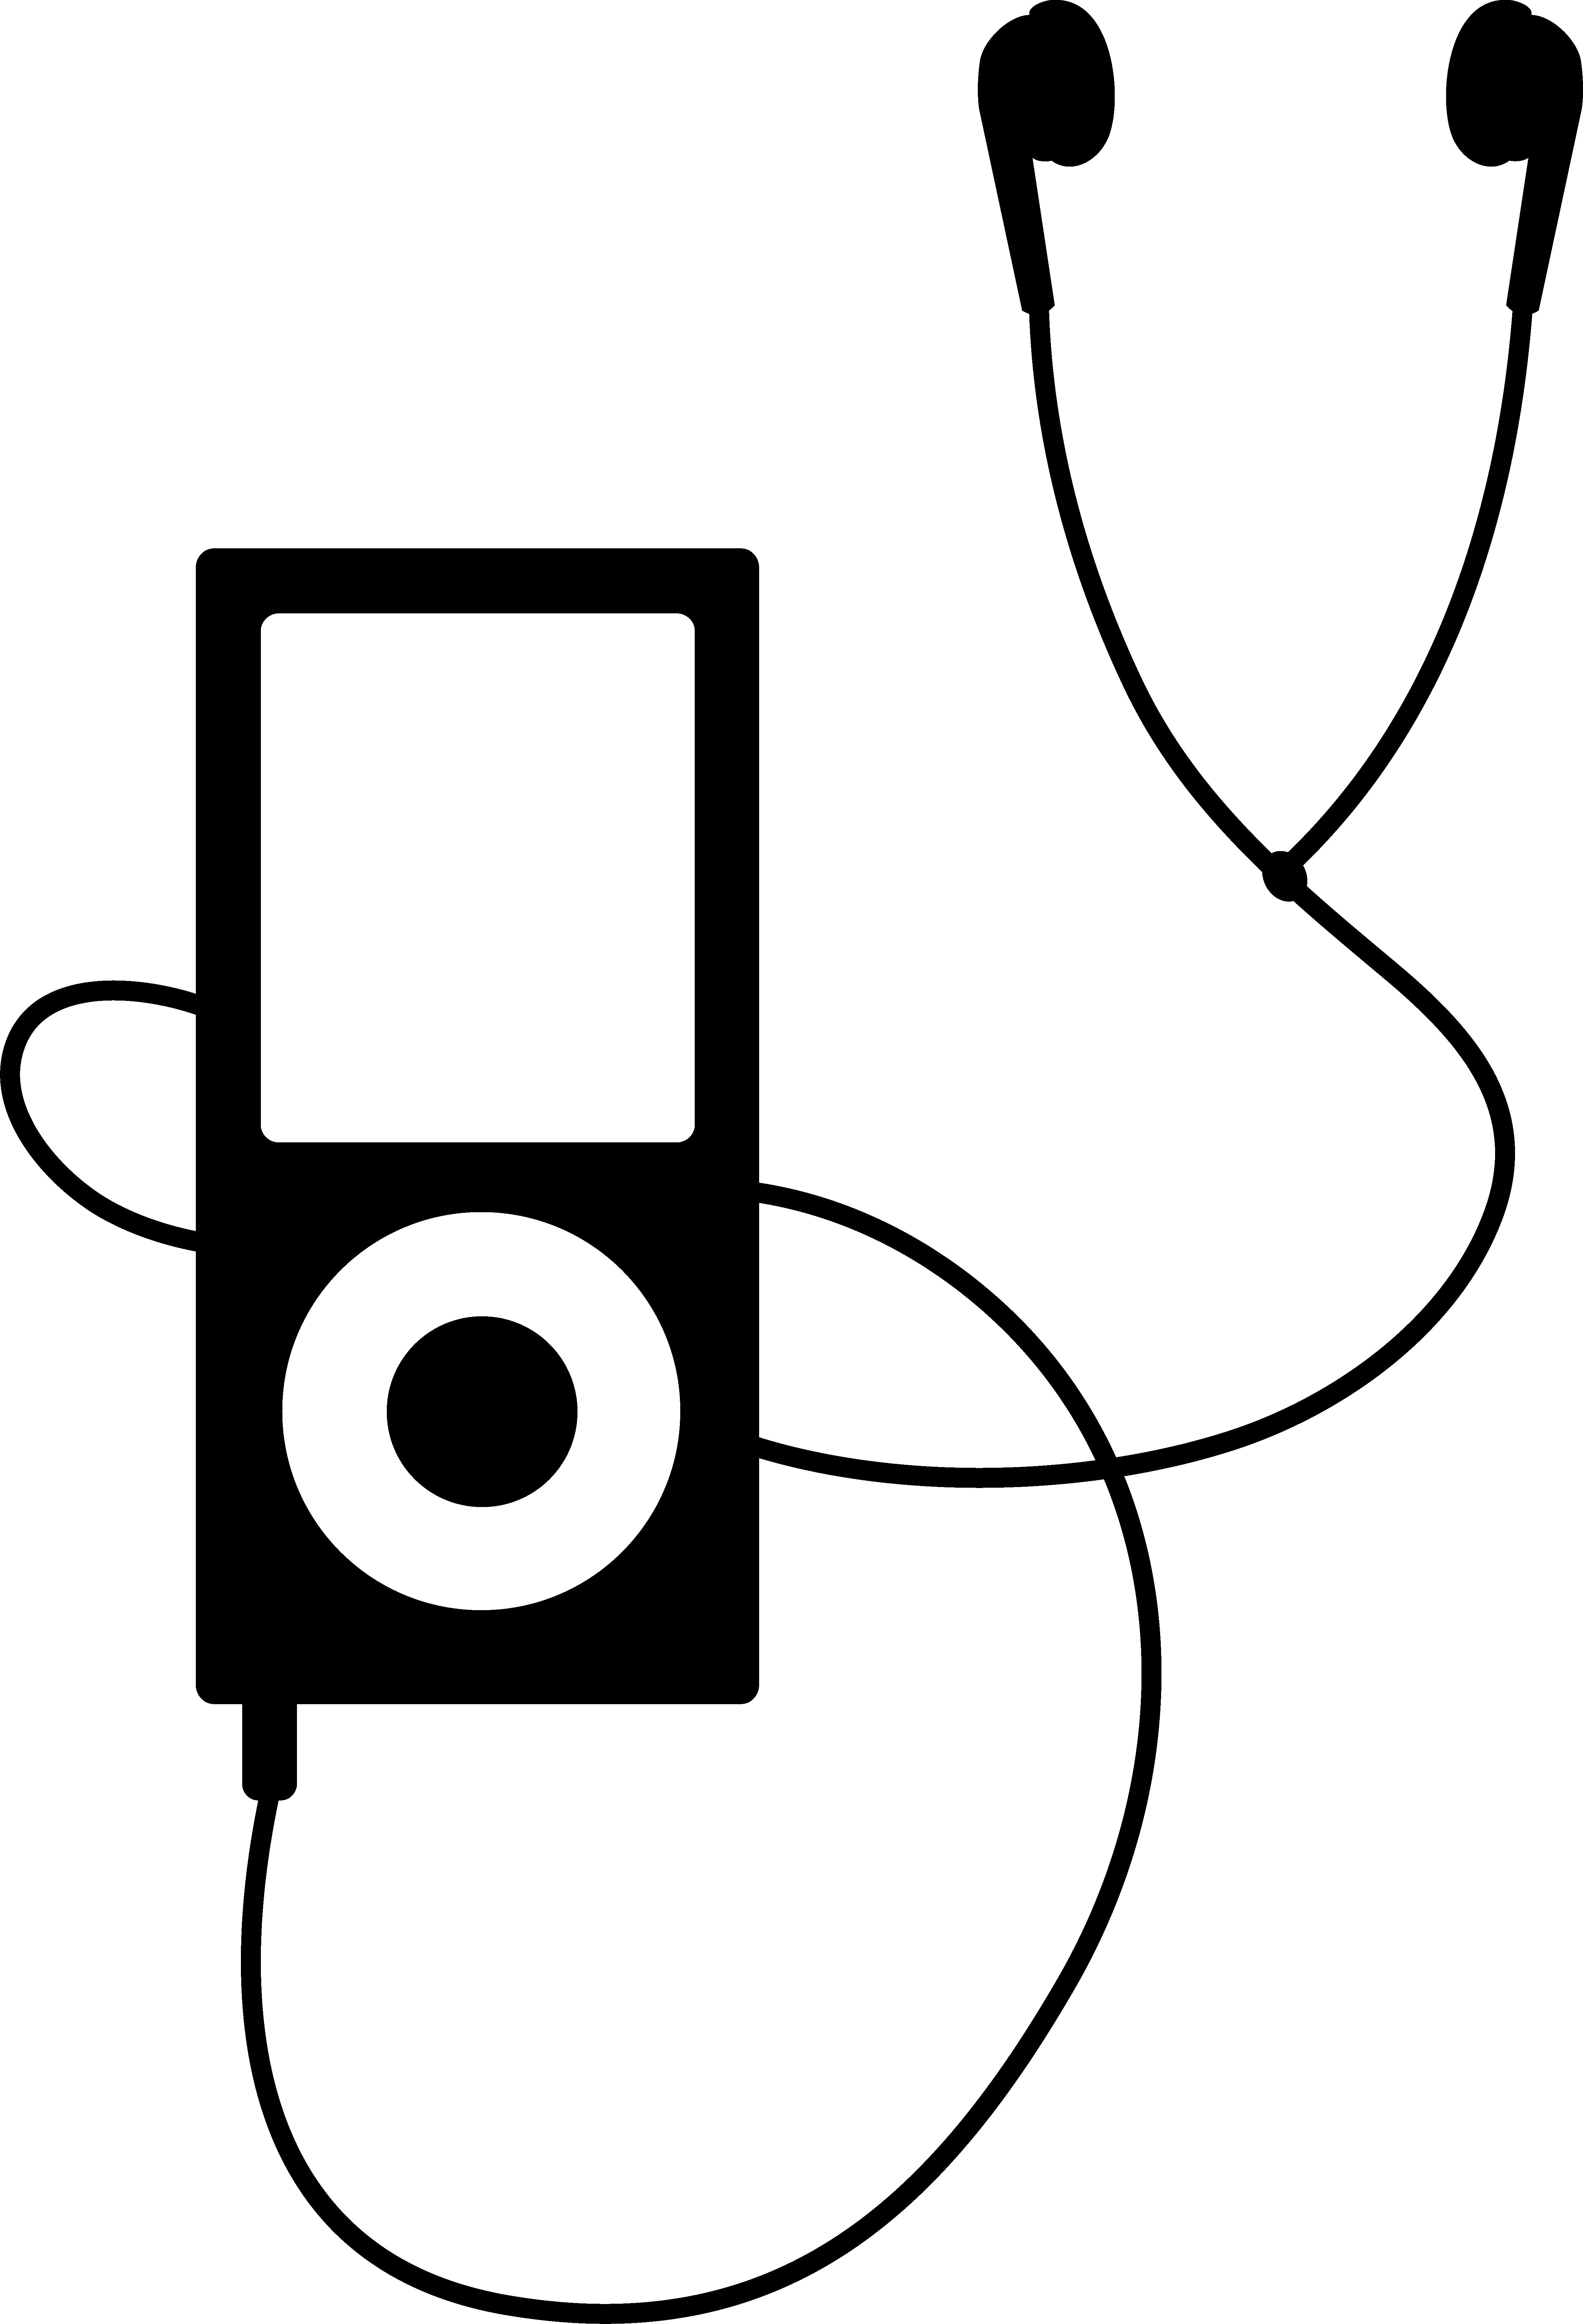 Headphone clipart drawn Ipod collection Art headphones clipart